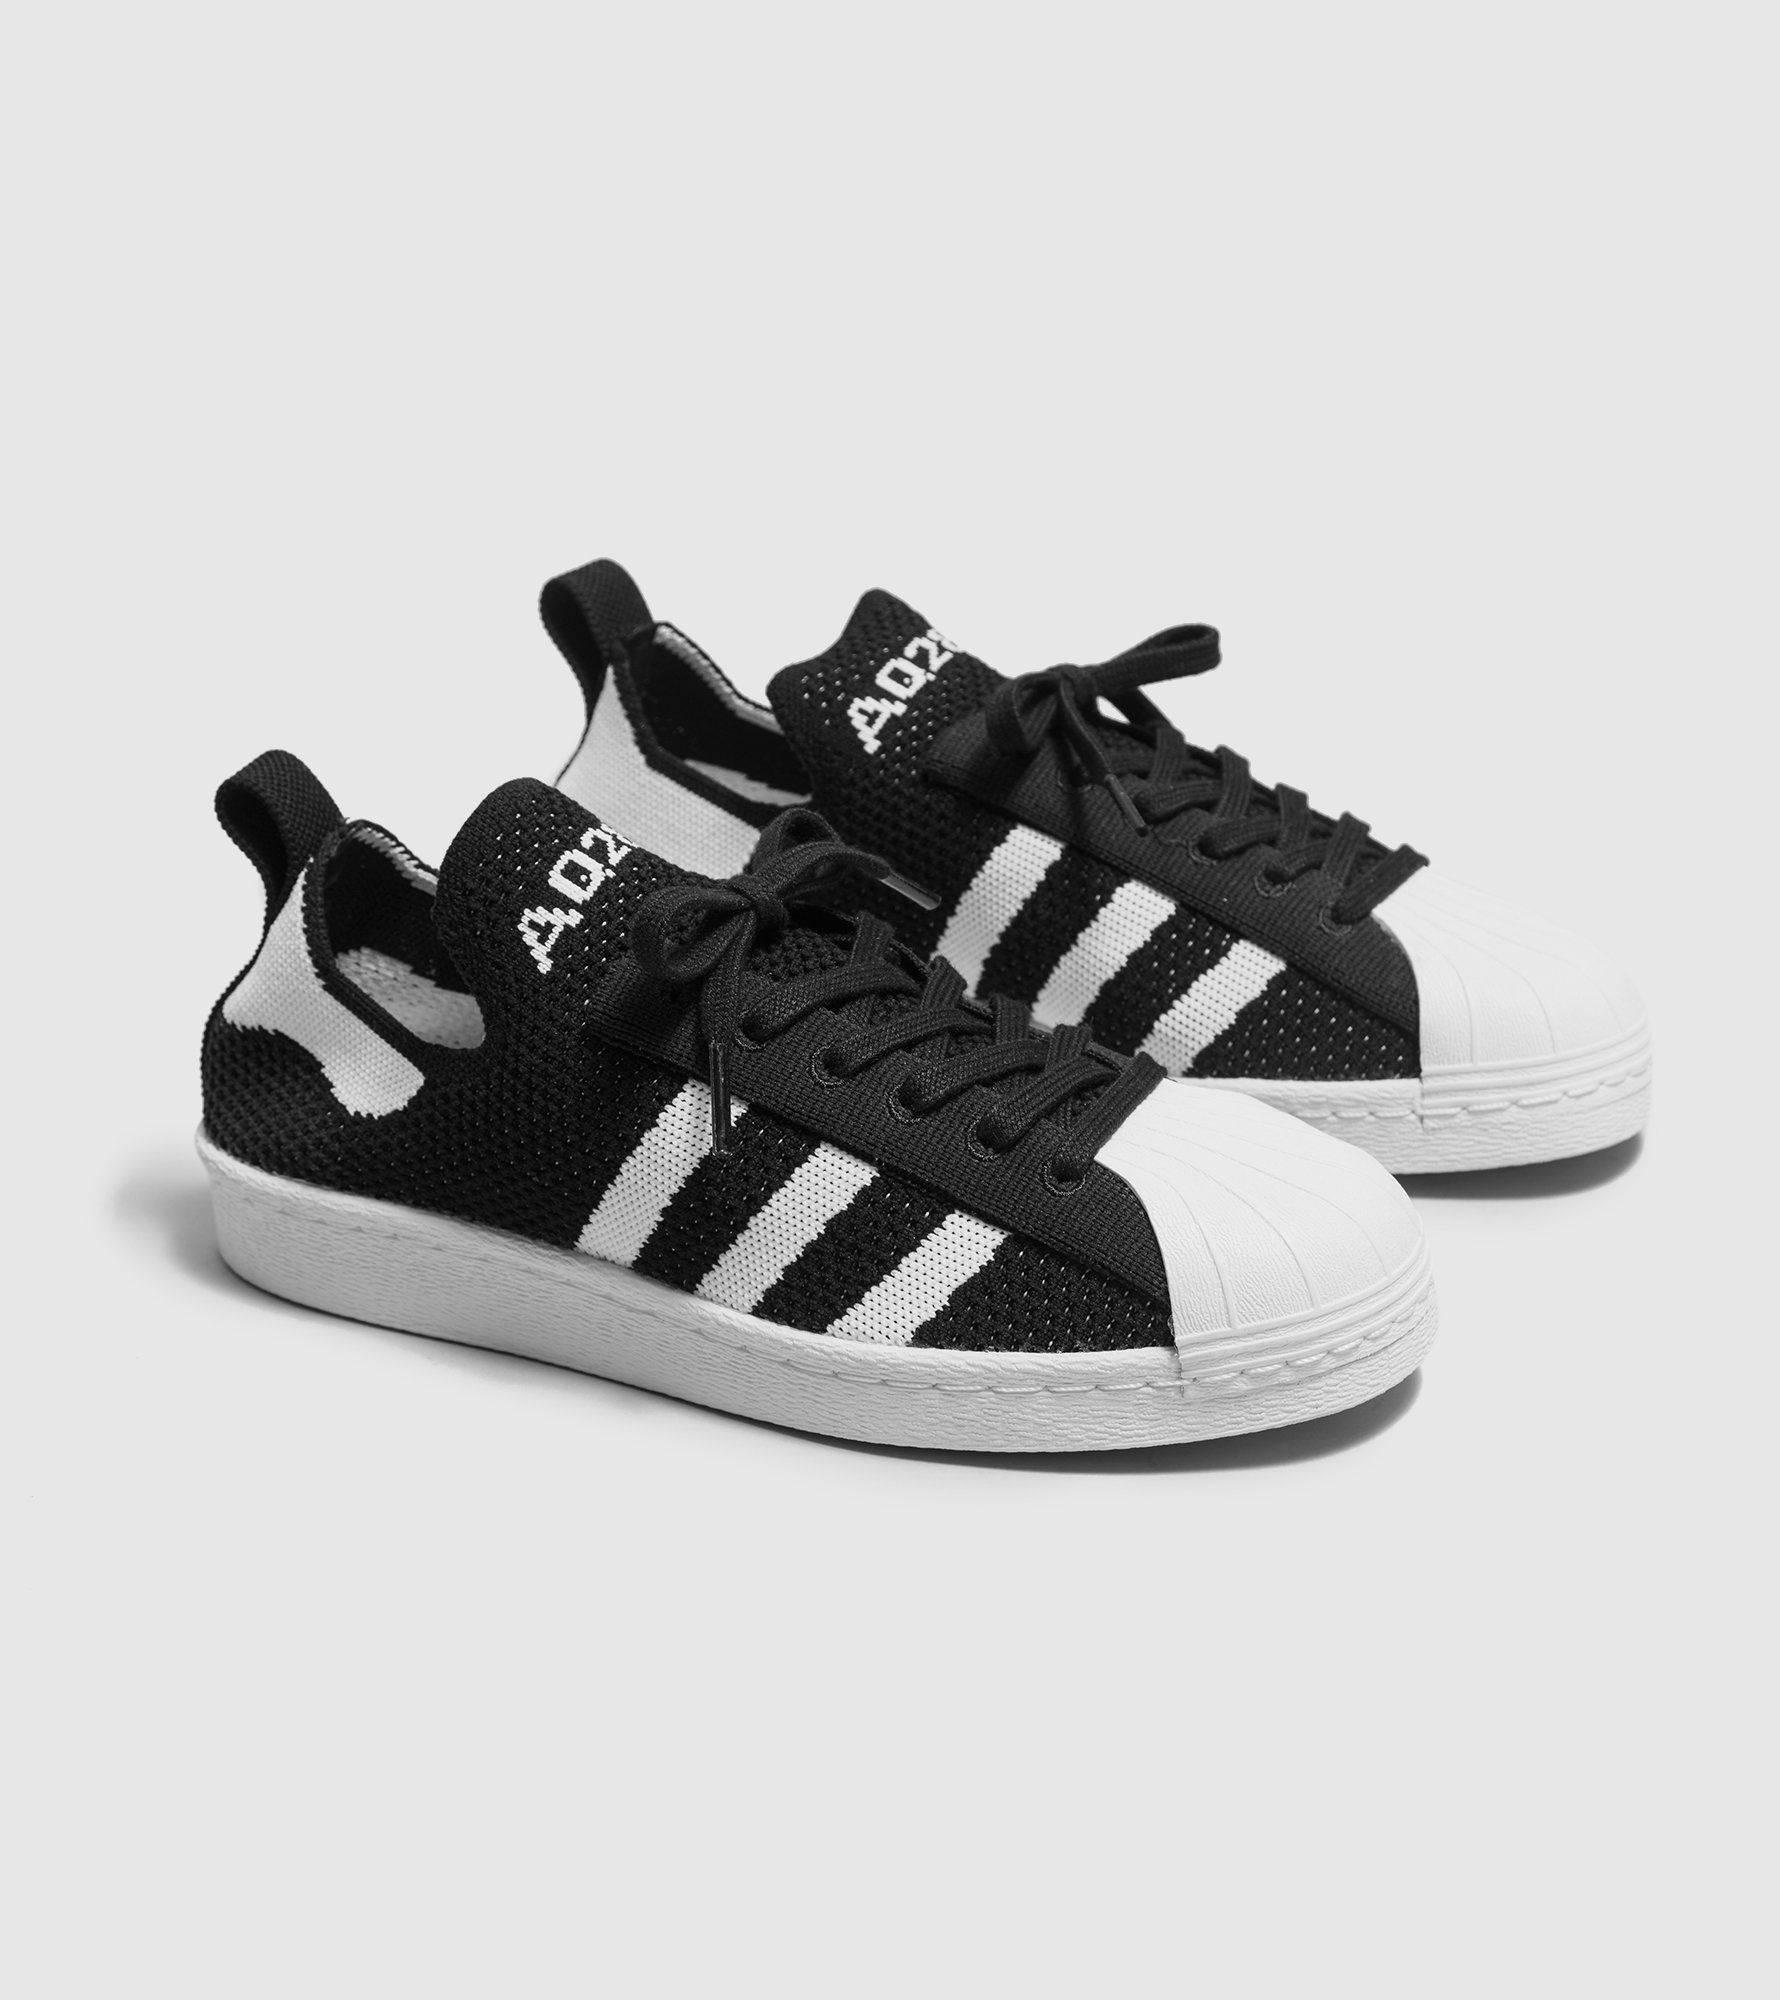 ¿Adidas Originals Superstar 80 primeknit  mujer 's size?